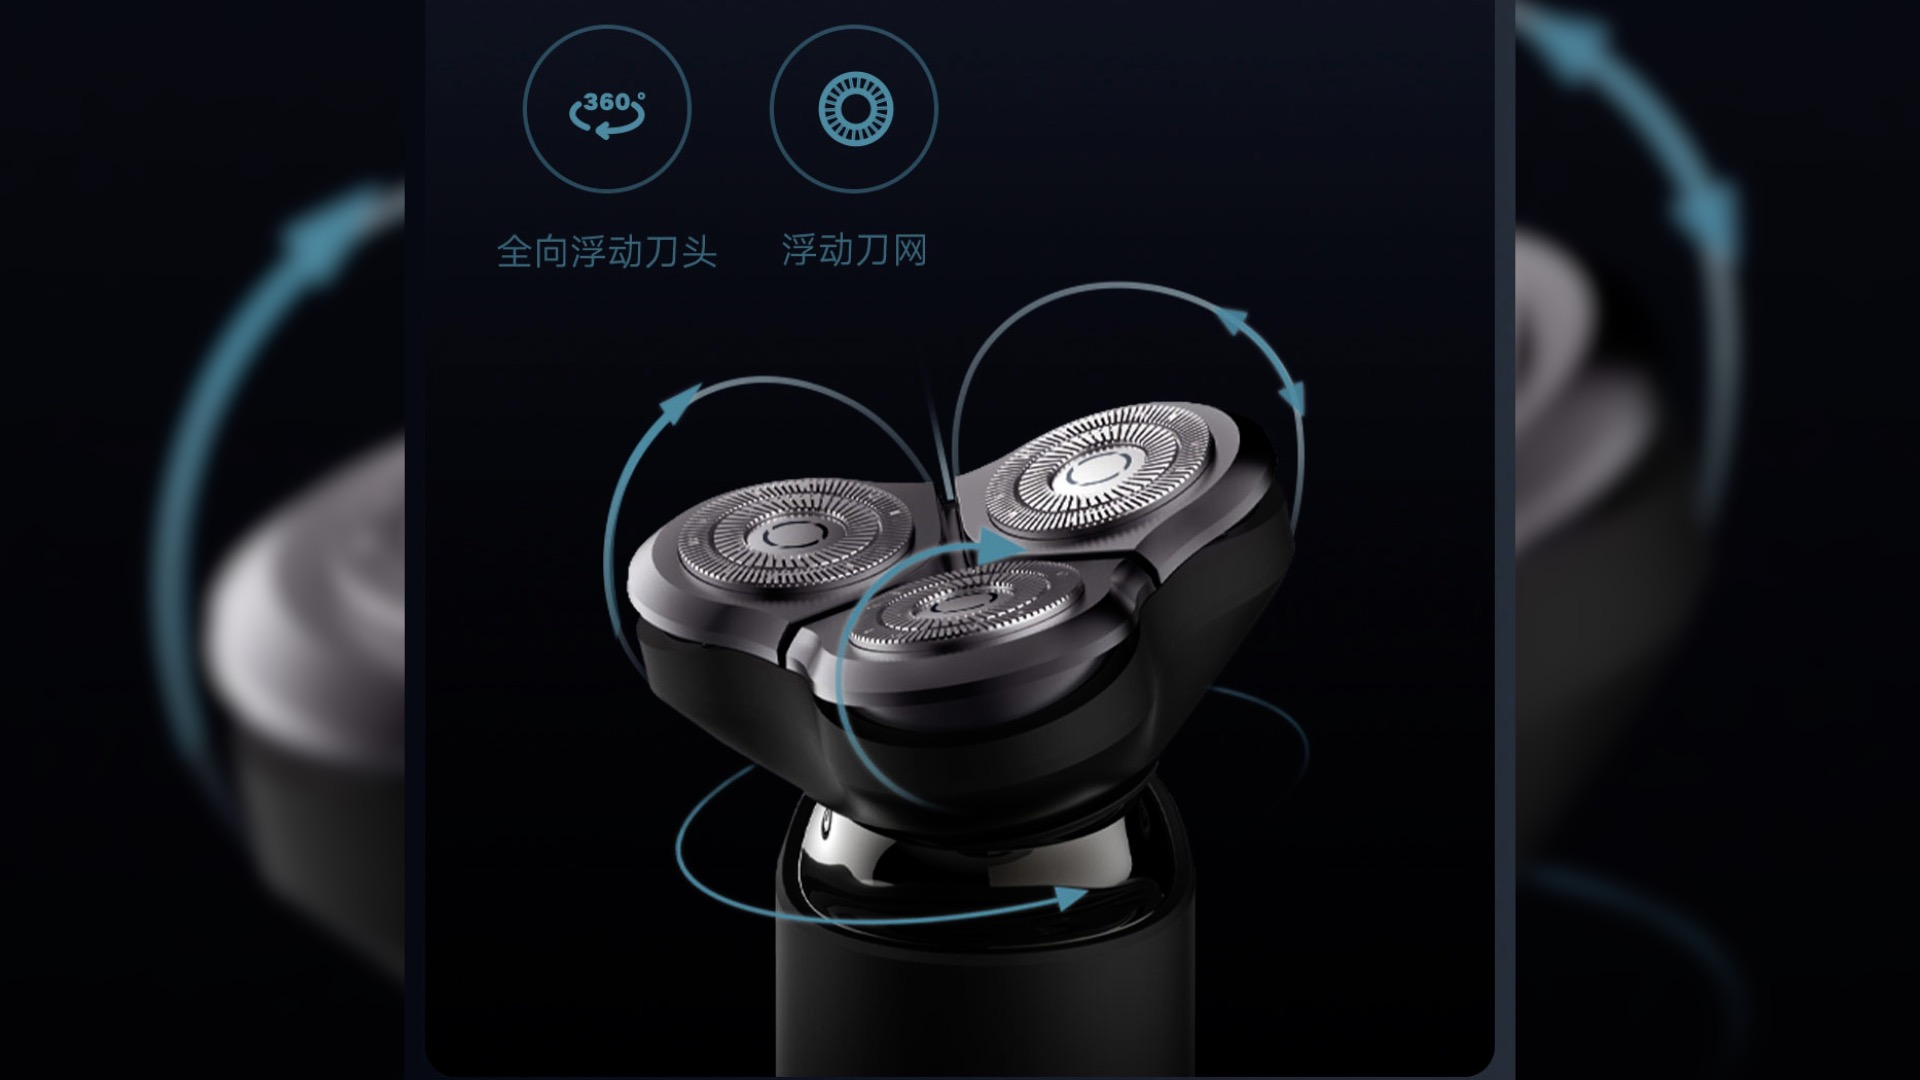 Xiaomi Mijia Electric Shaver S500C